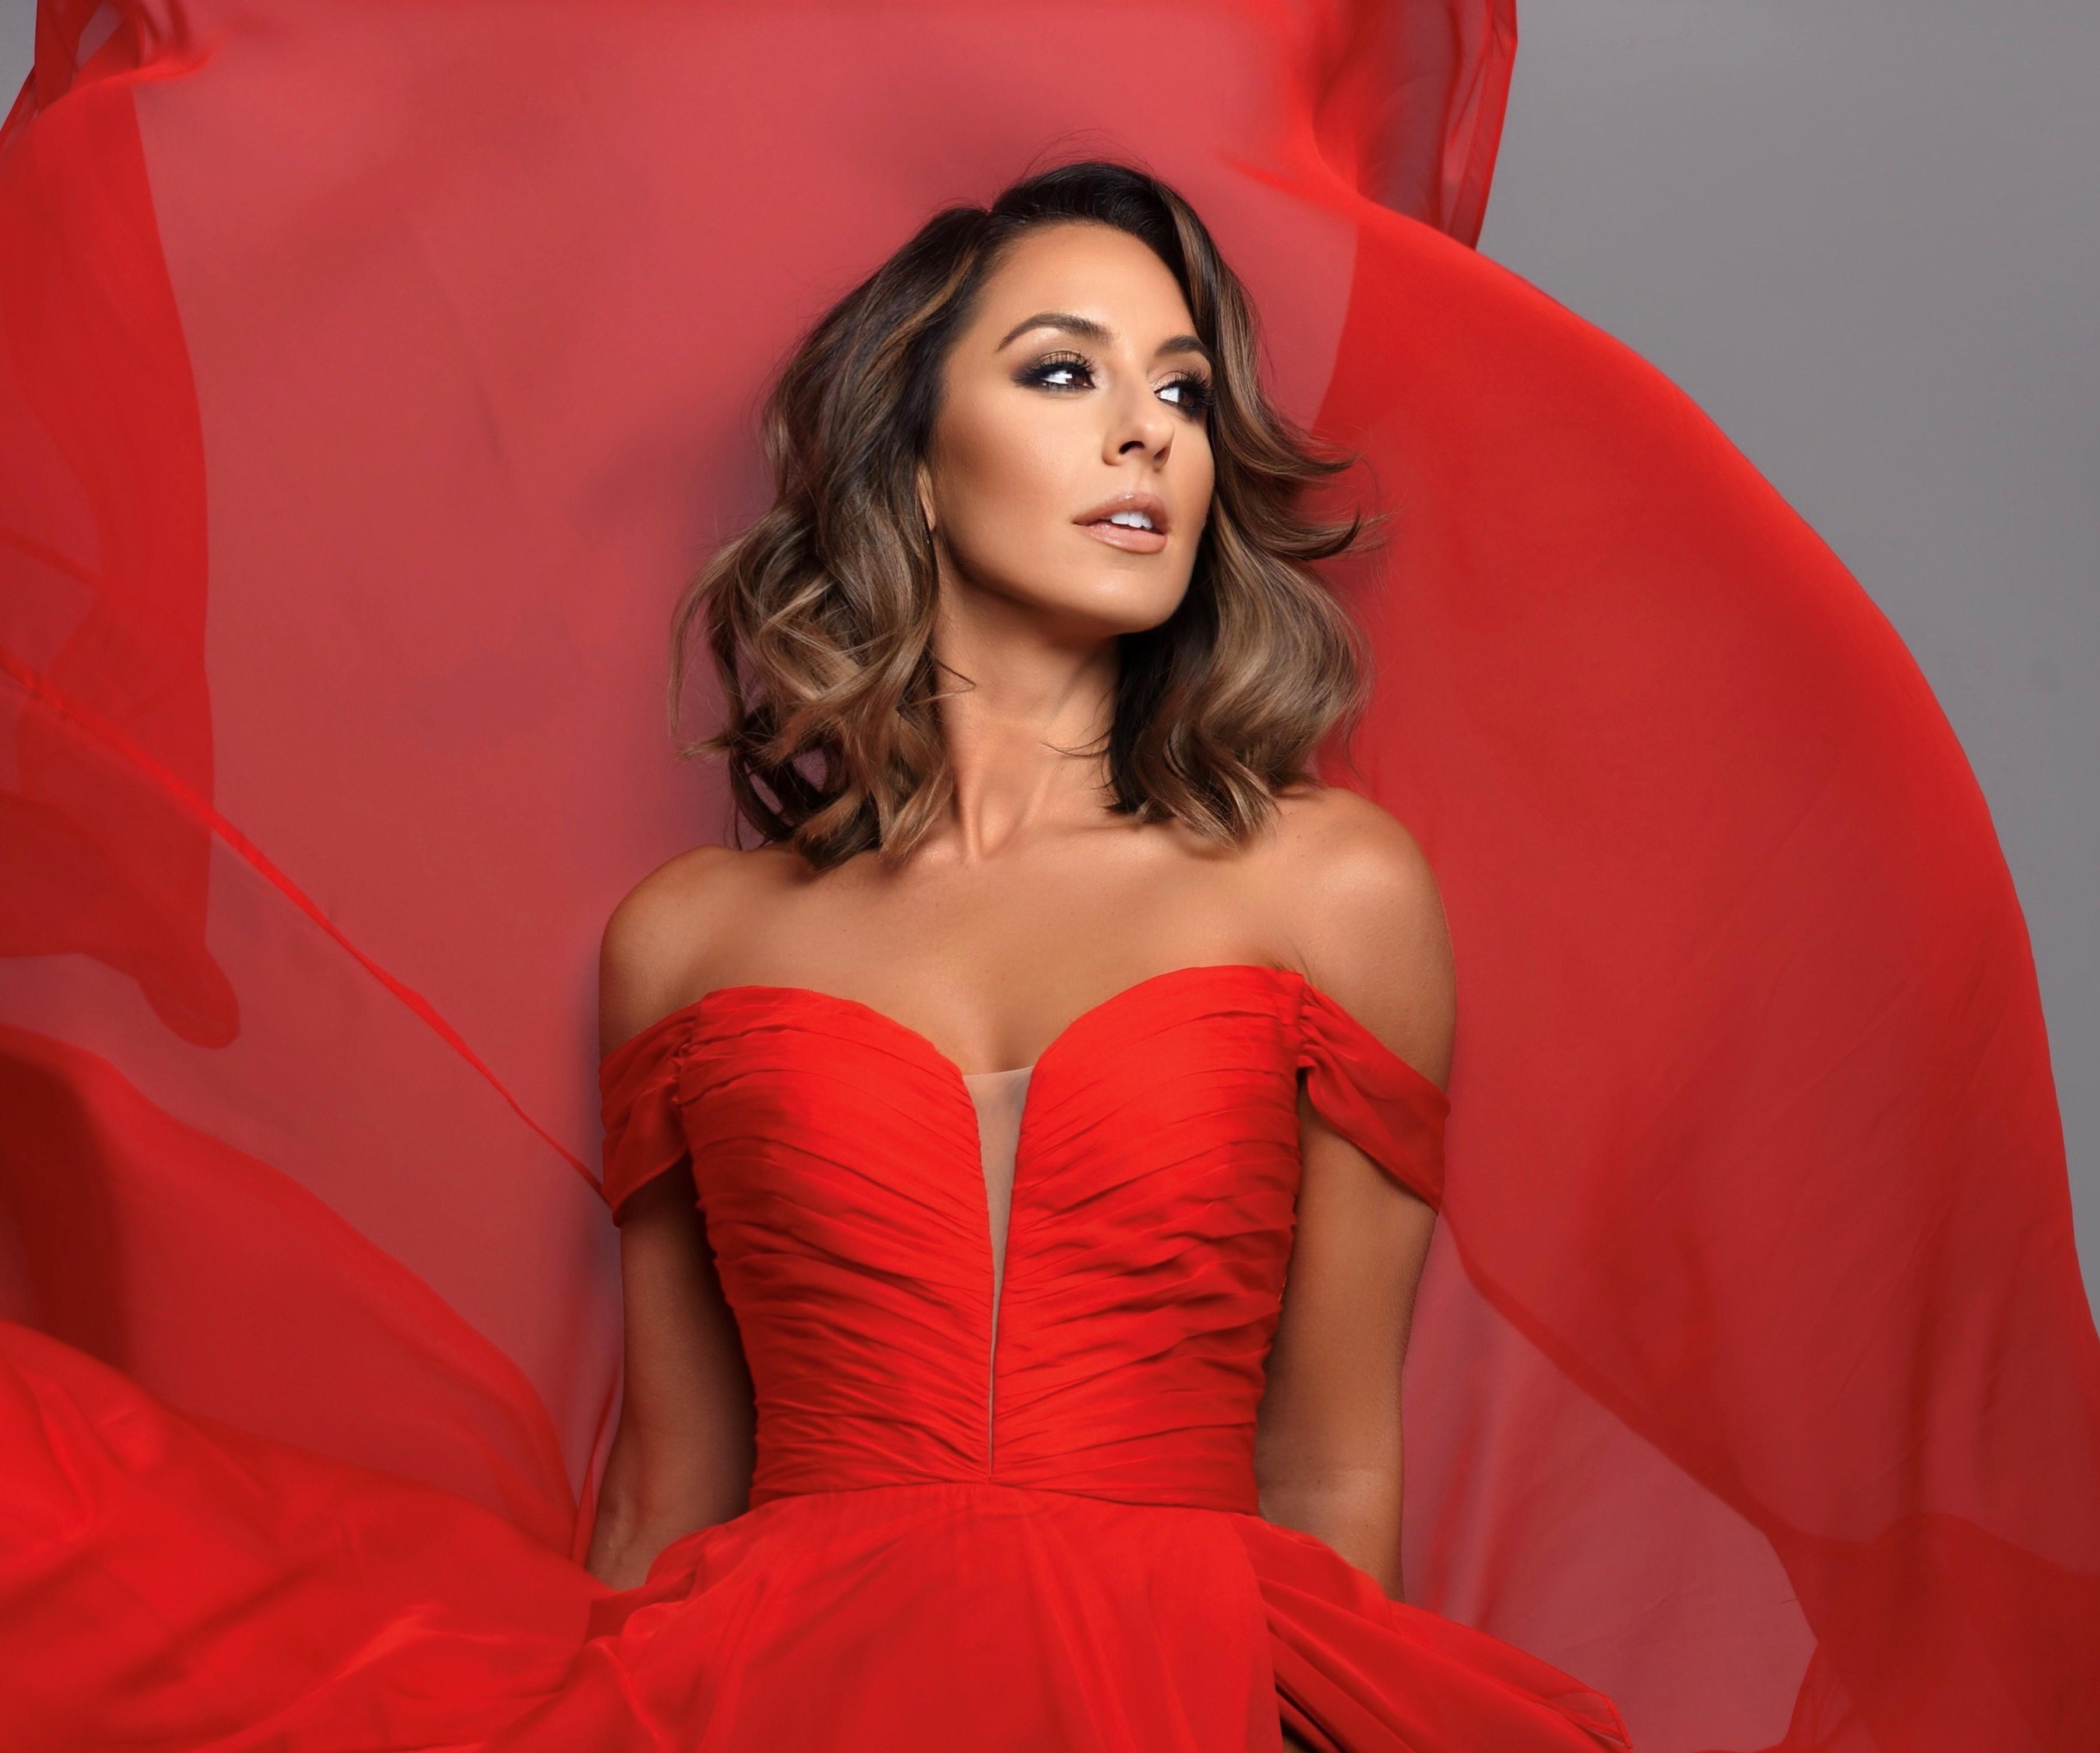 jenene-2020-approved-red-dress